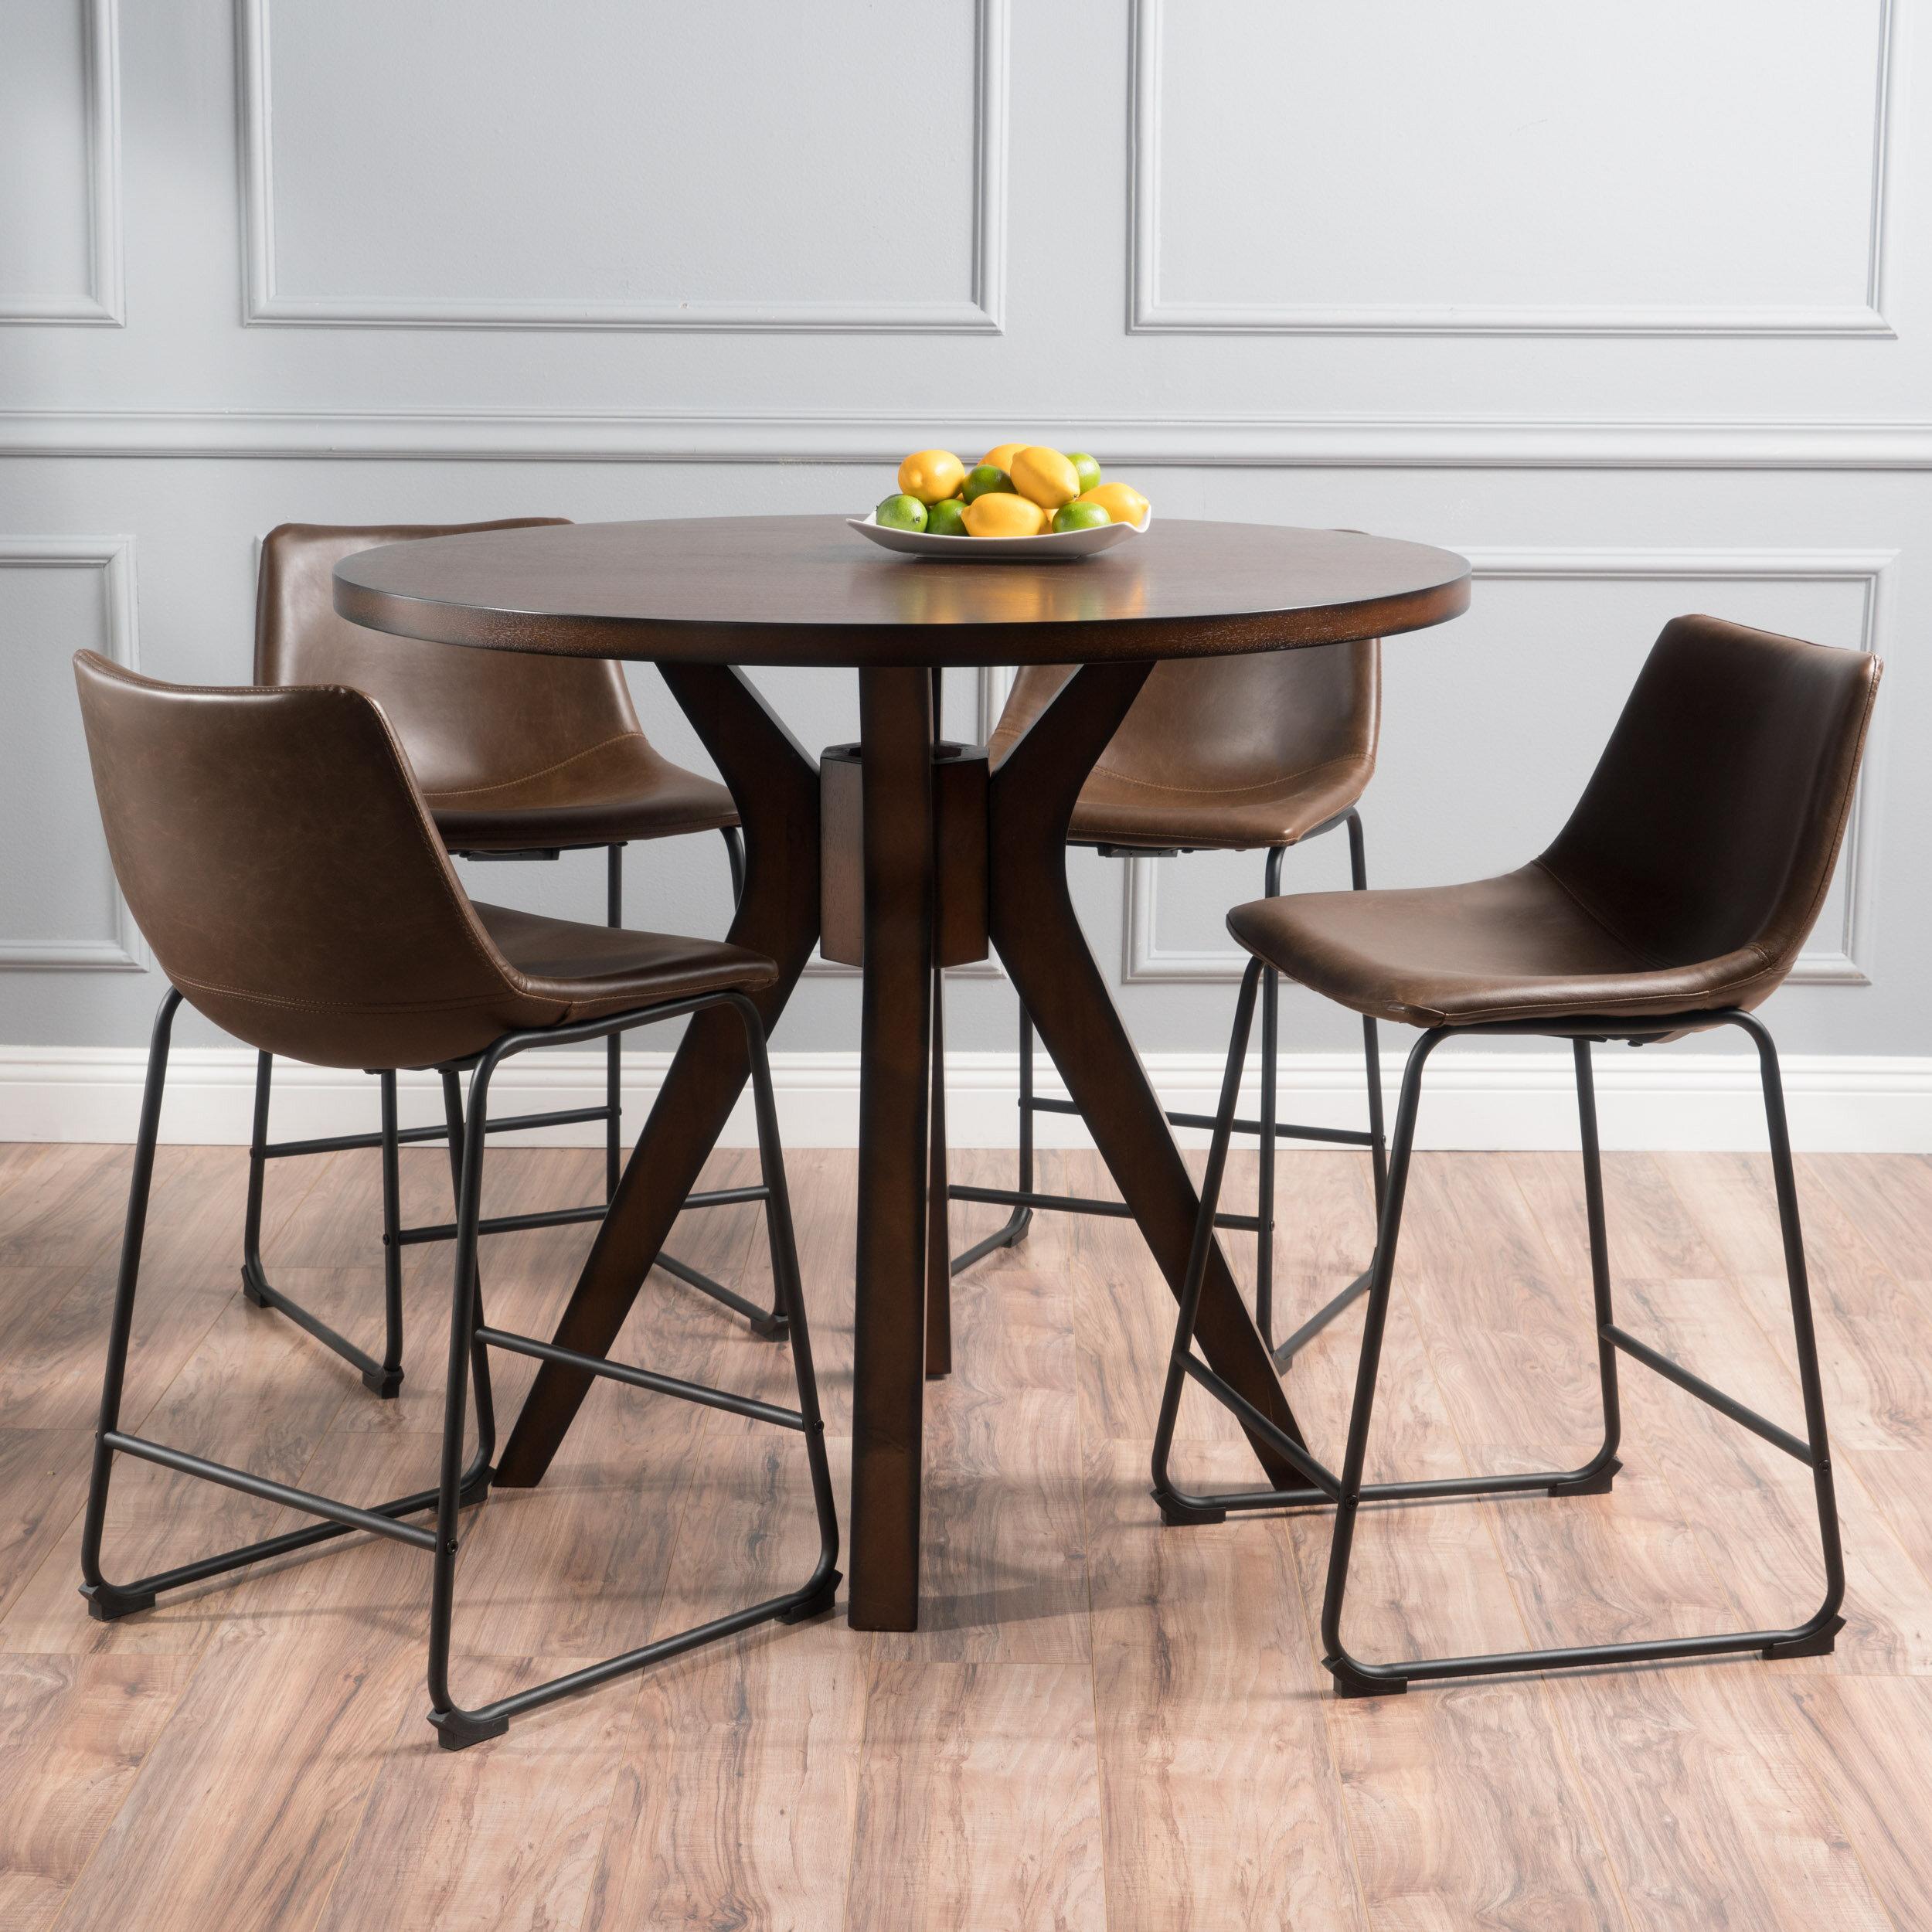 Brayden Studio Maclin Faux Wood Round 5 Piece Dining Set U0026 Reviews | Wayfair